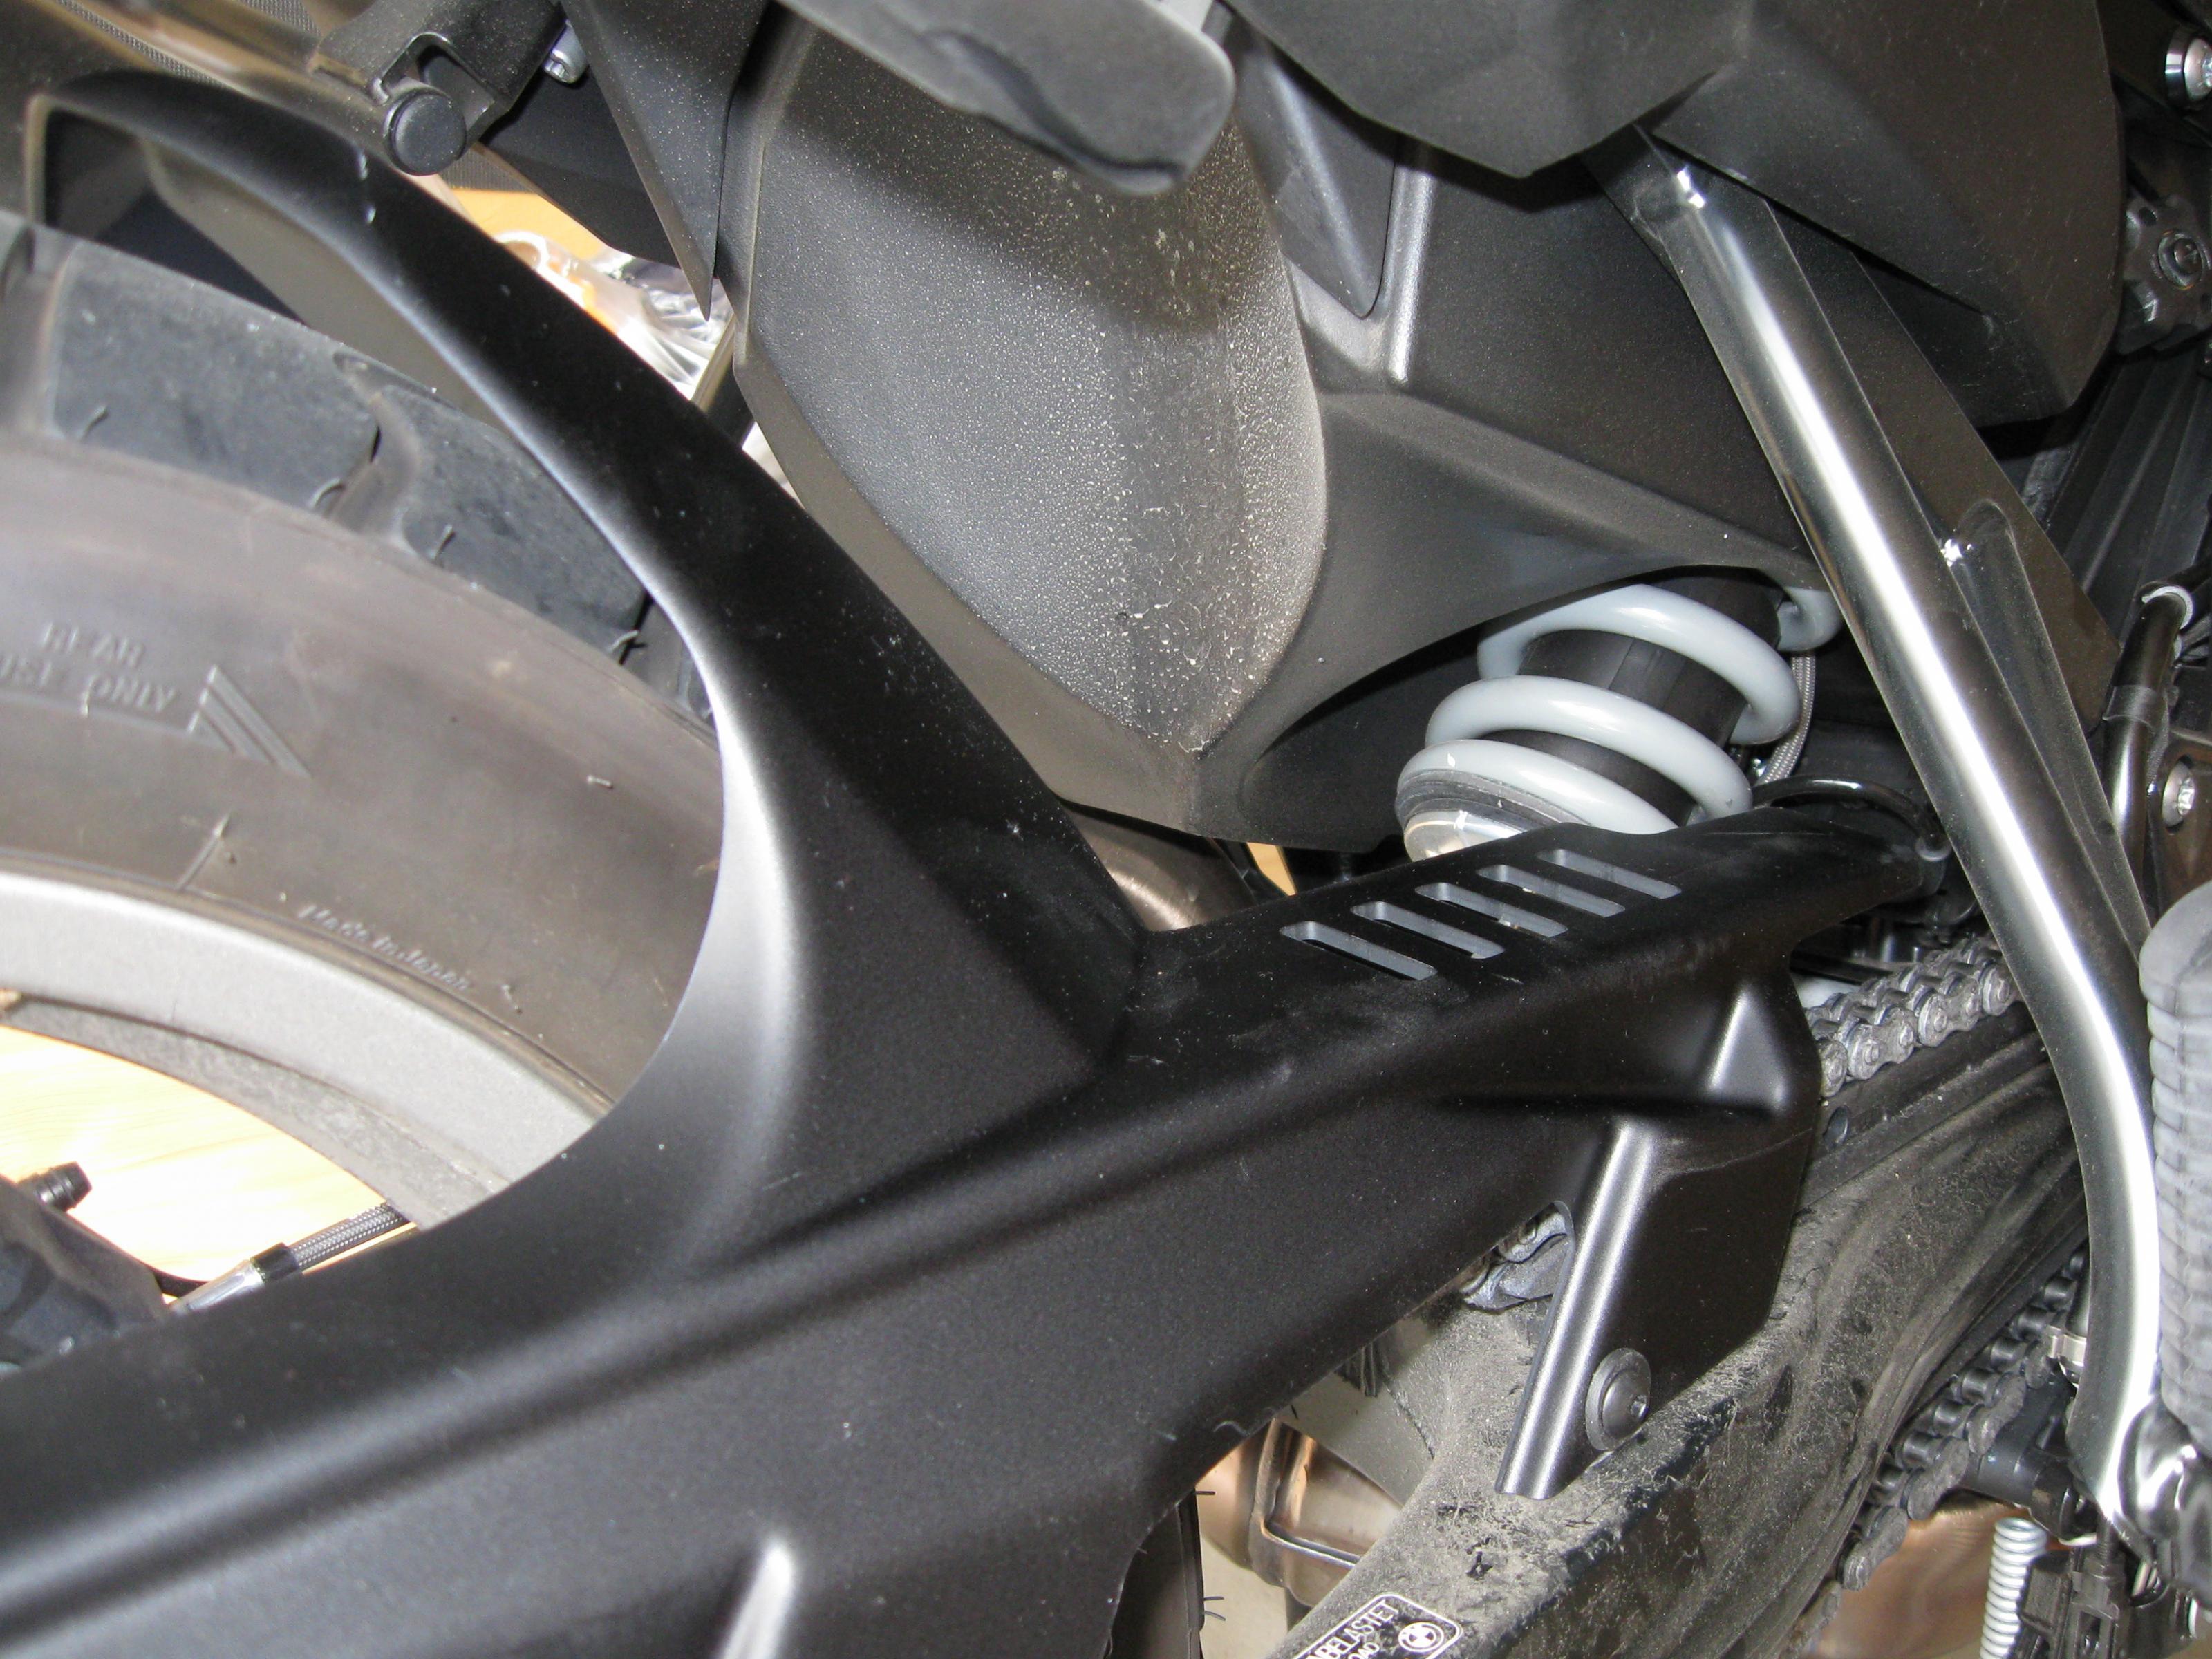 2013-06-27_c_puig-hinterradabdeckung-kettenschutz-angebaut-3-.jpg